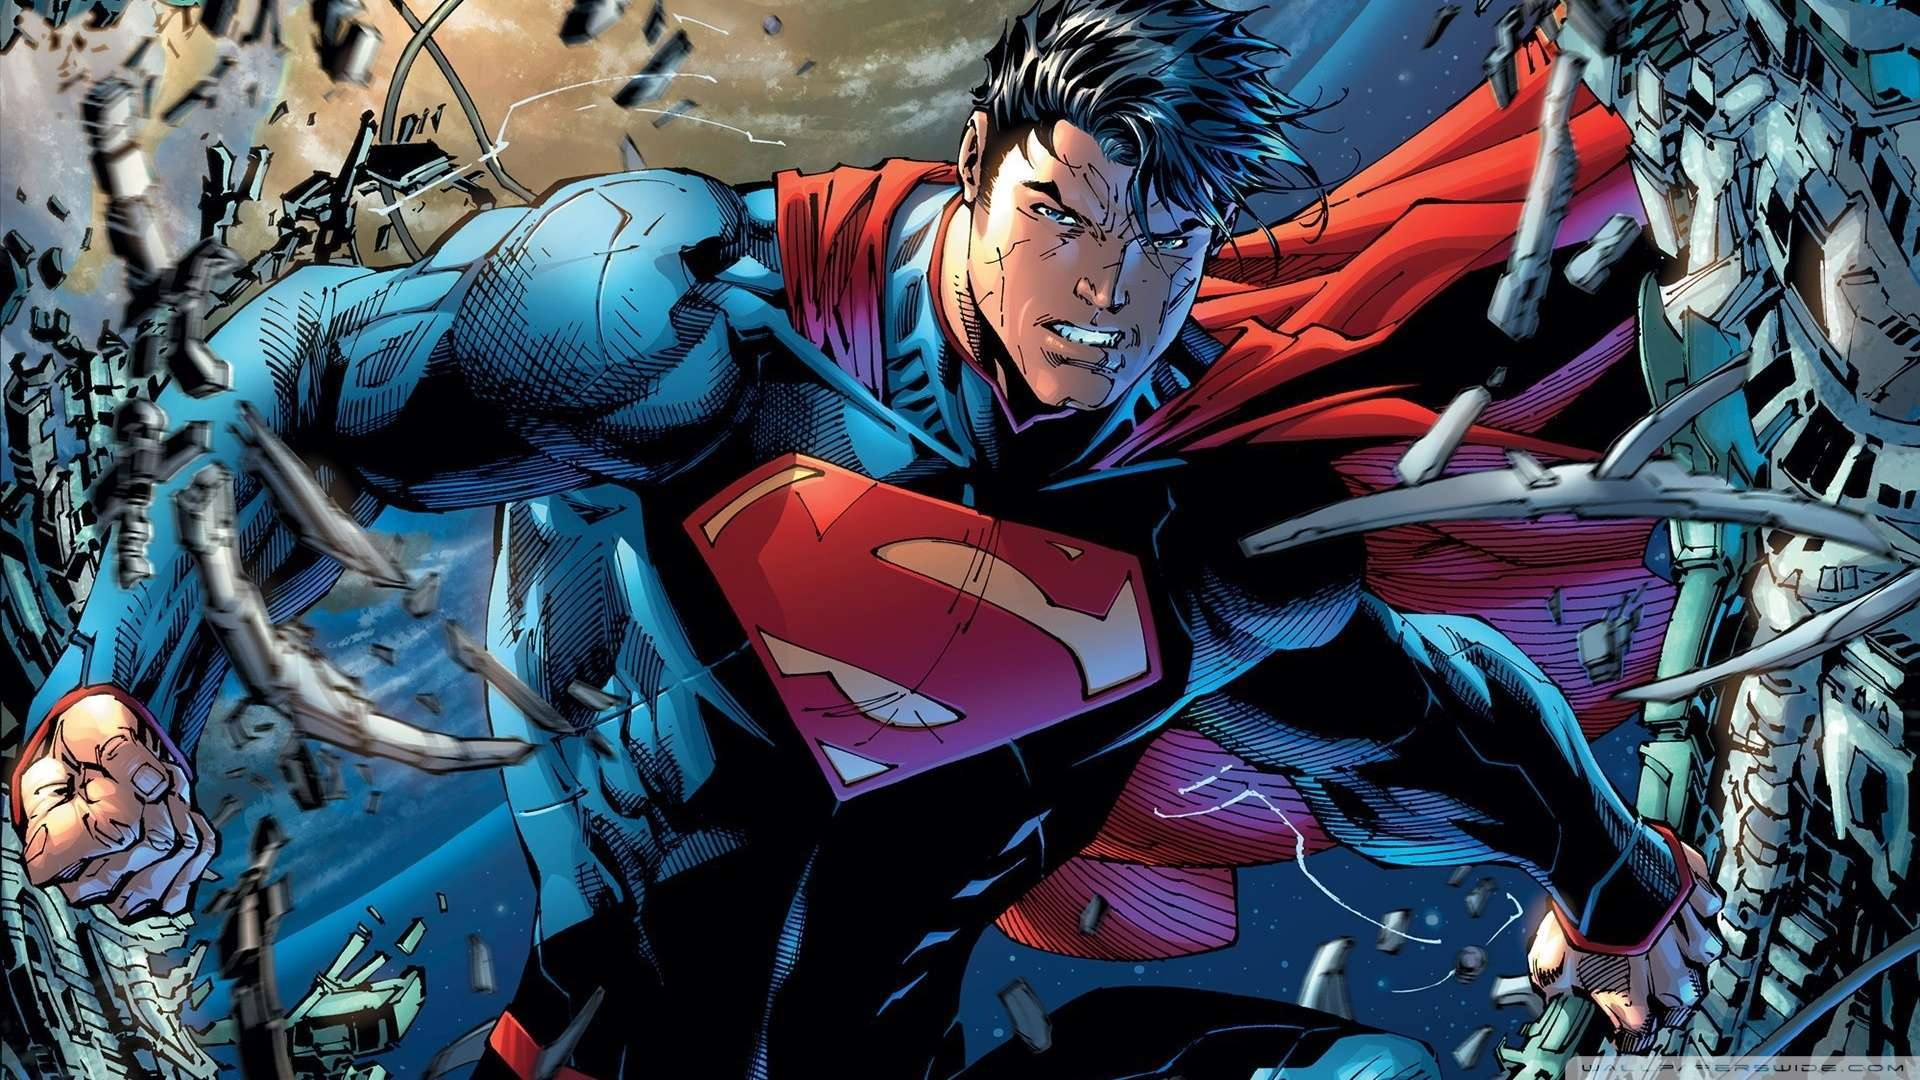 Hd wallpaper comic - Superman Hd Wallpaper For Desktop 14